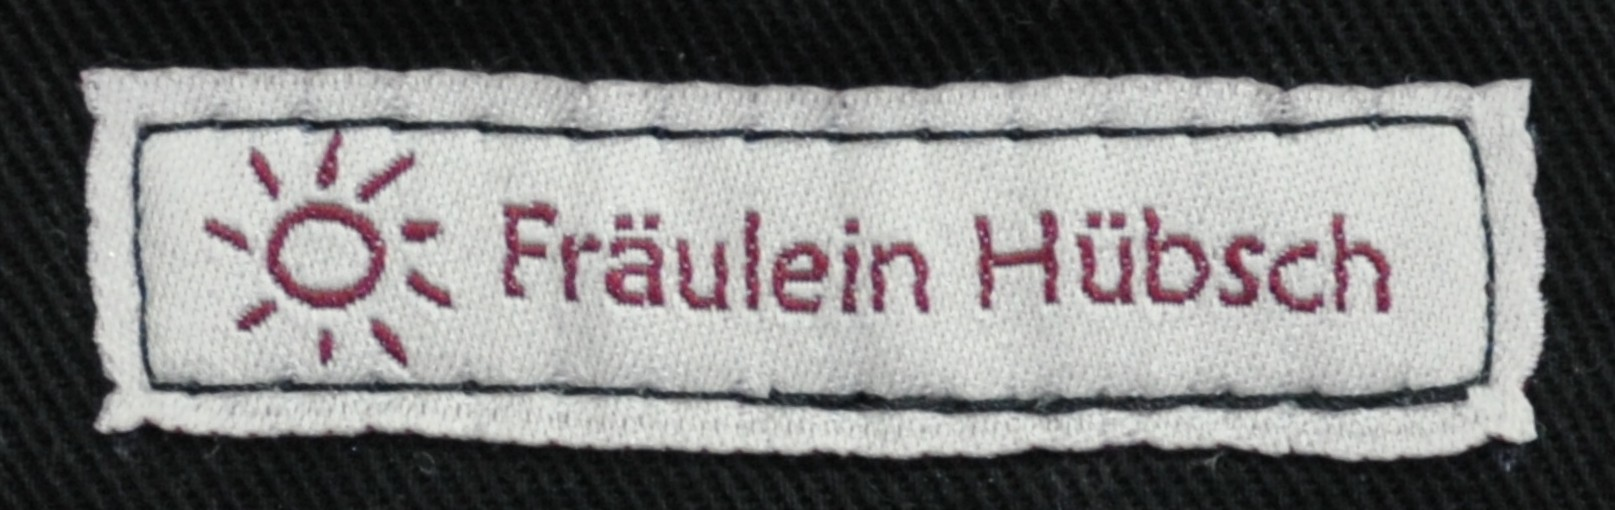 tragehilfen.de